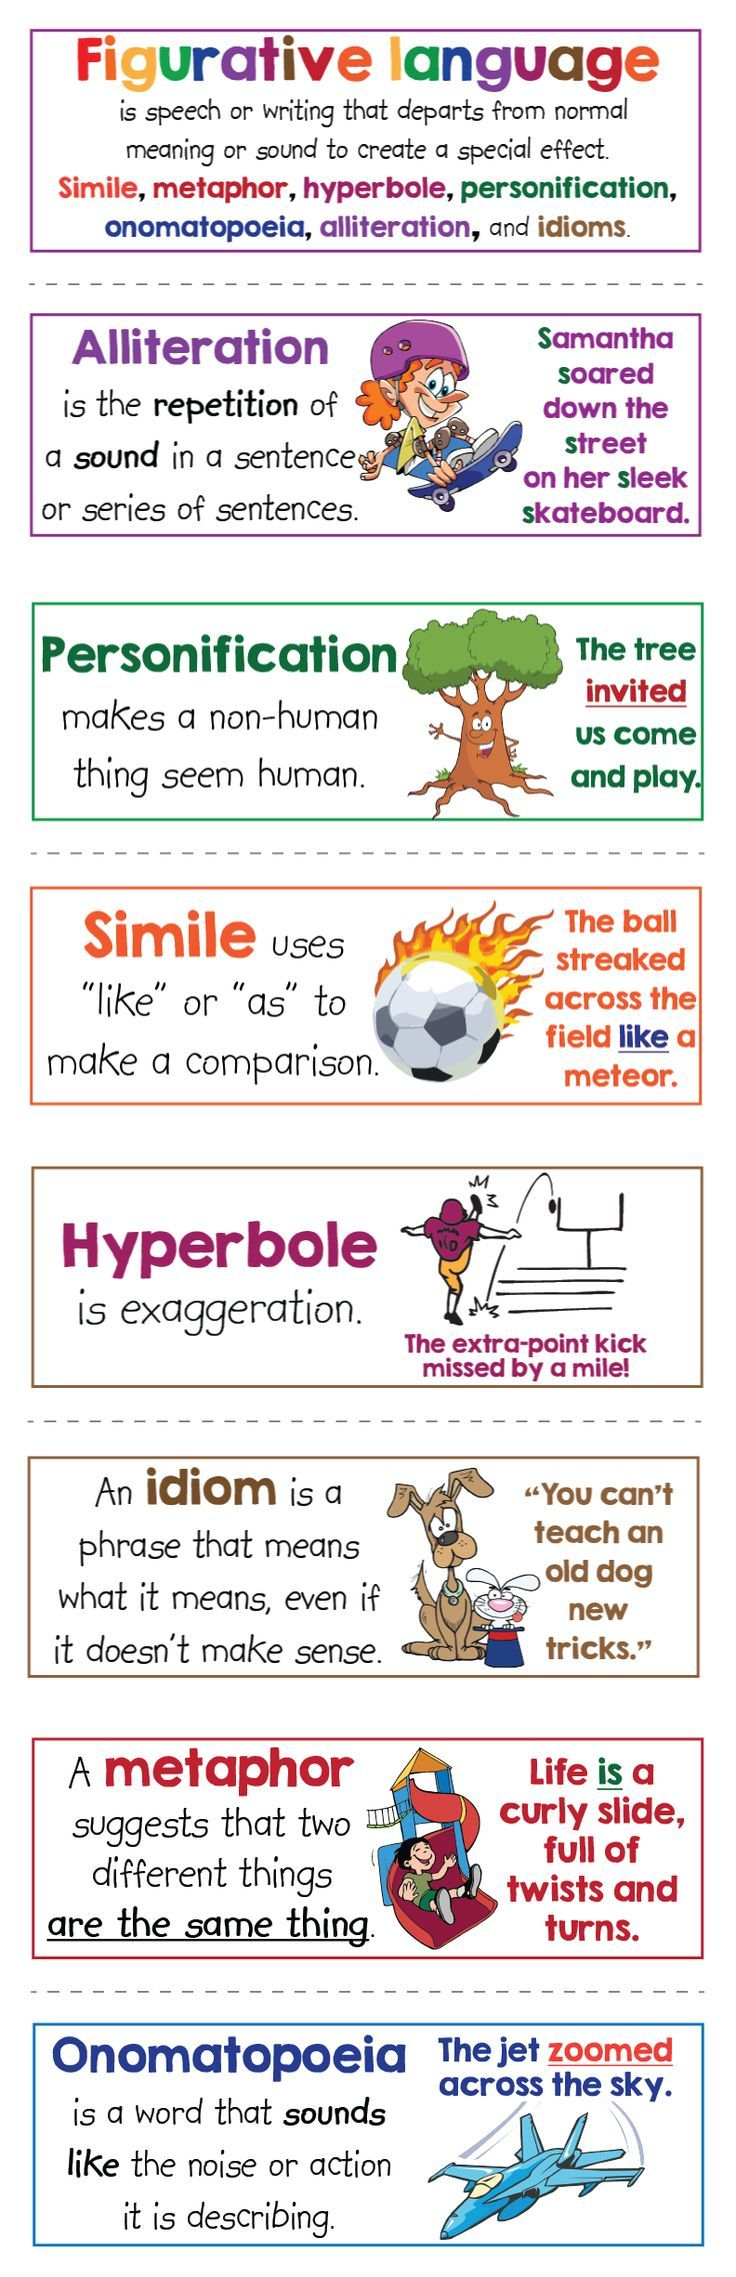 Worksheets Alliteration Worksheets the 25 best alliteration words ideas on pinterest figurative language anchor chartsposterscards hyperbole idioms metaphors